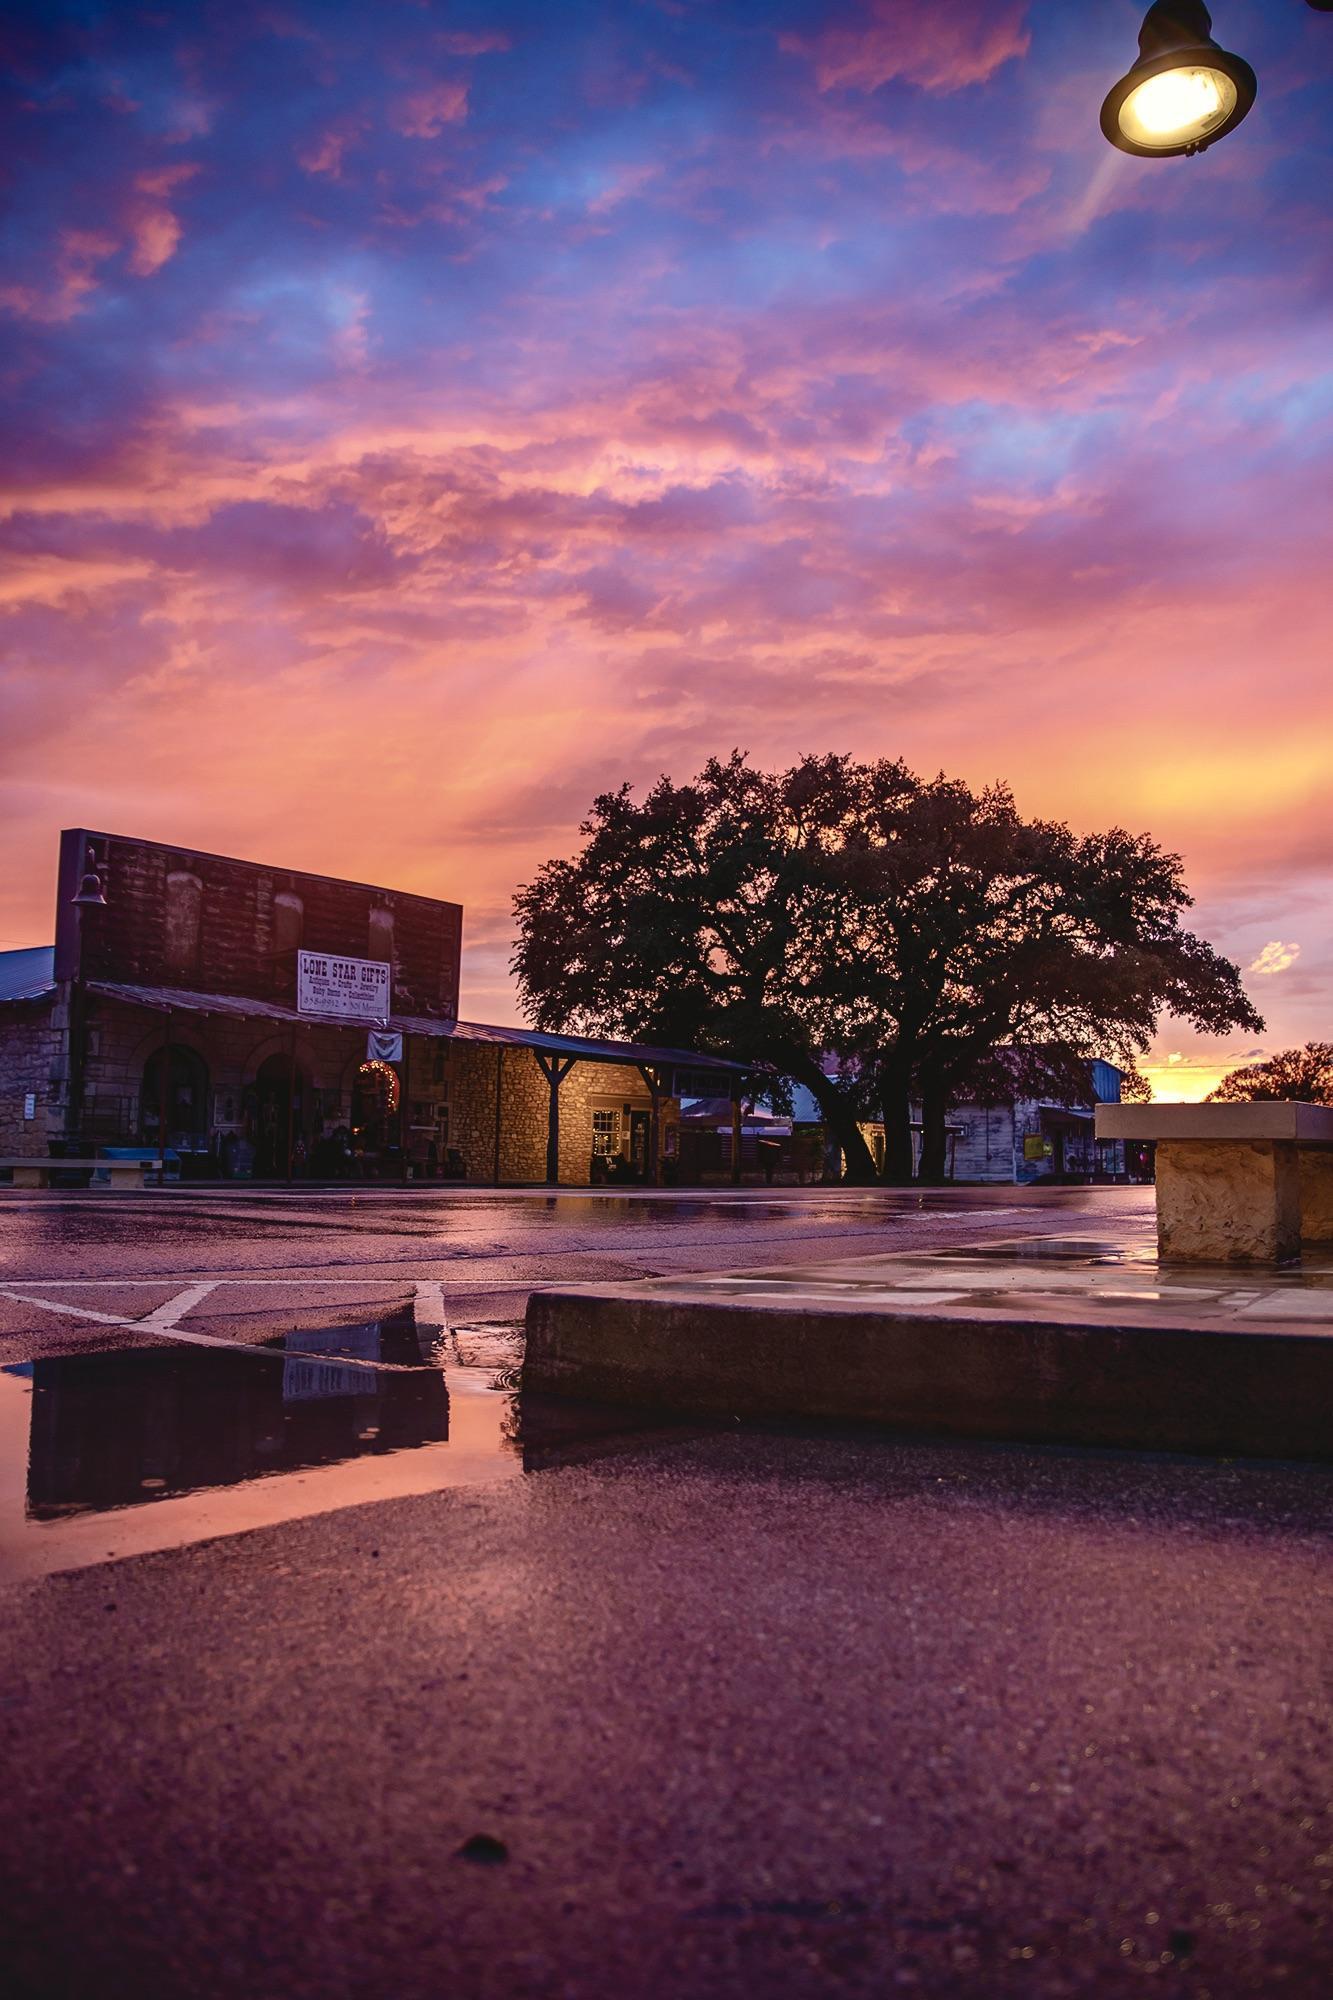 Mercer Street after a thunderstorm at sunset.